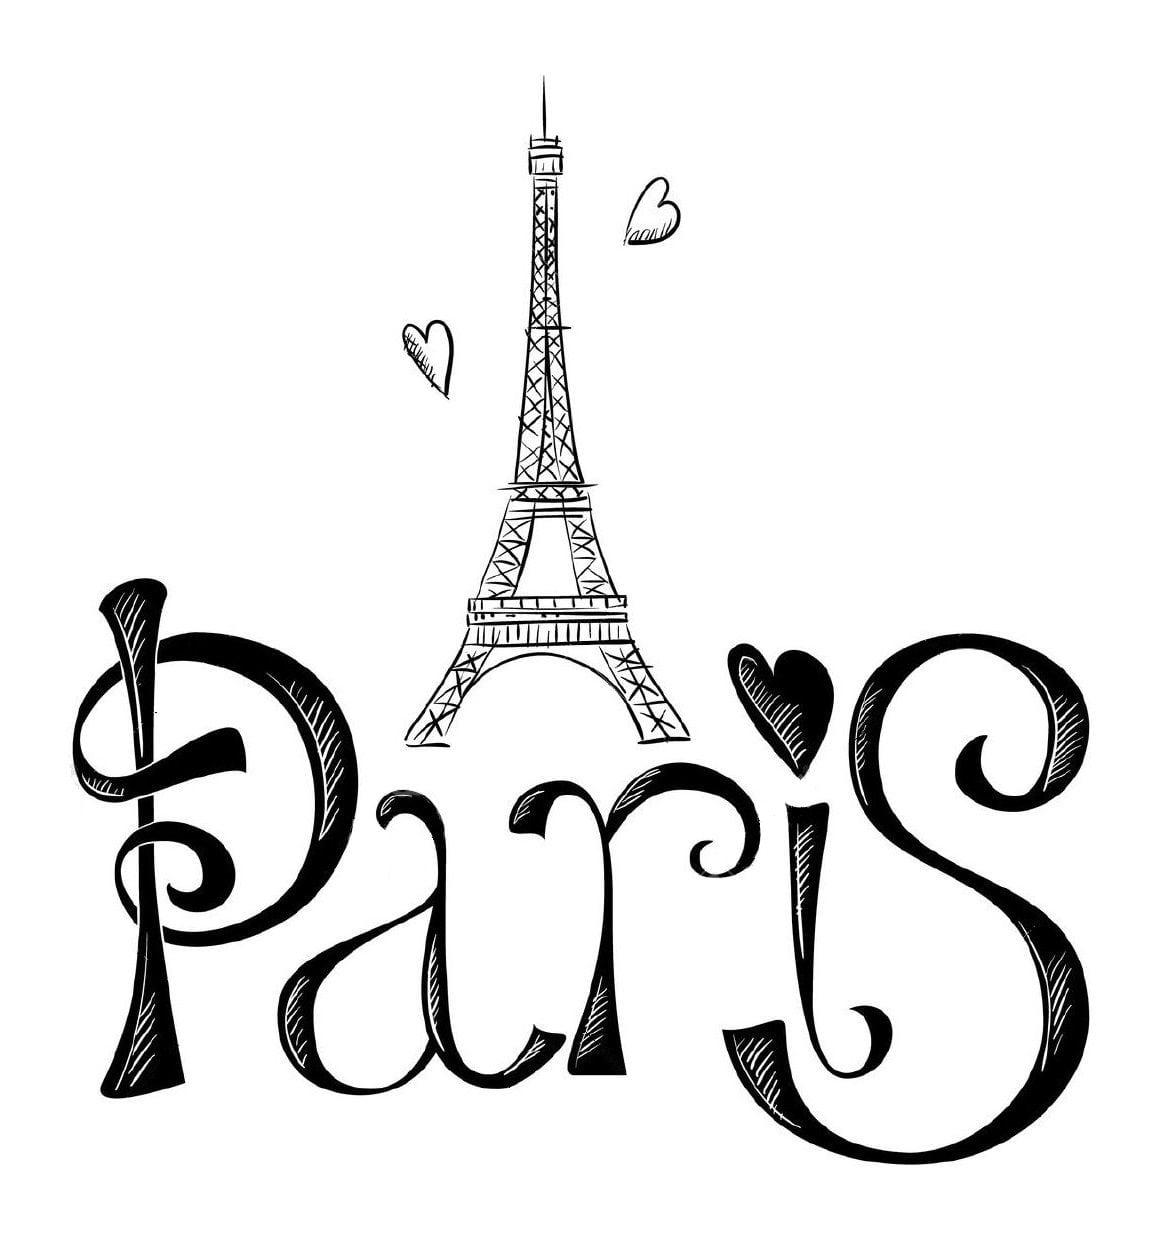 ▷ Torre Eiffel  Dibujos E Imágenes Para Dibujar La  Torre De París